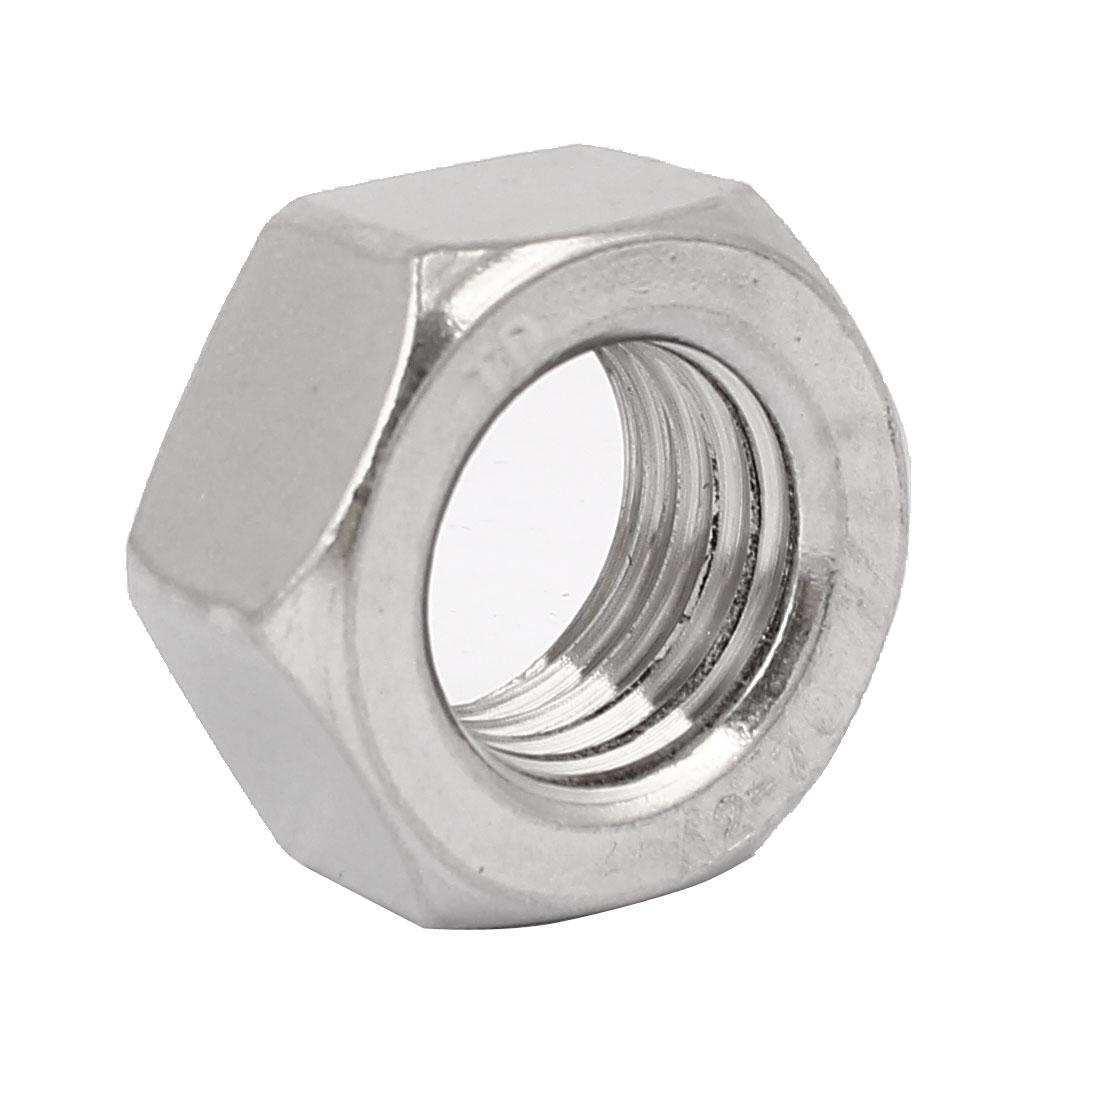 M24 Thread Dia 304 Stainless Steel Hex Nut Screw Cap Fastener Silver Tone